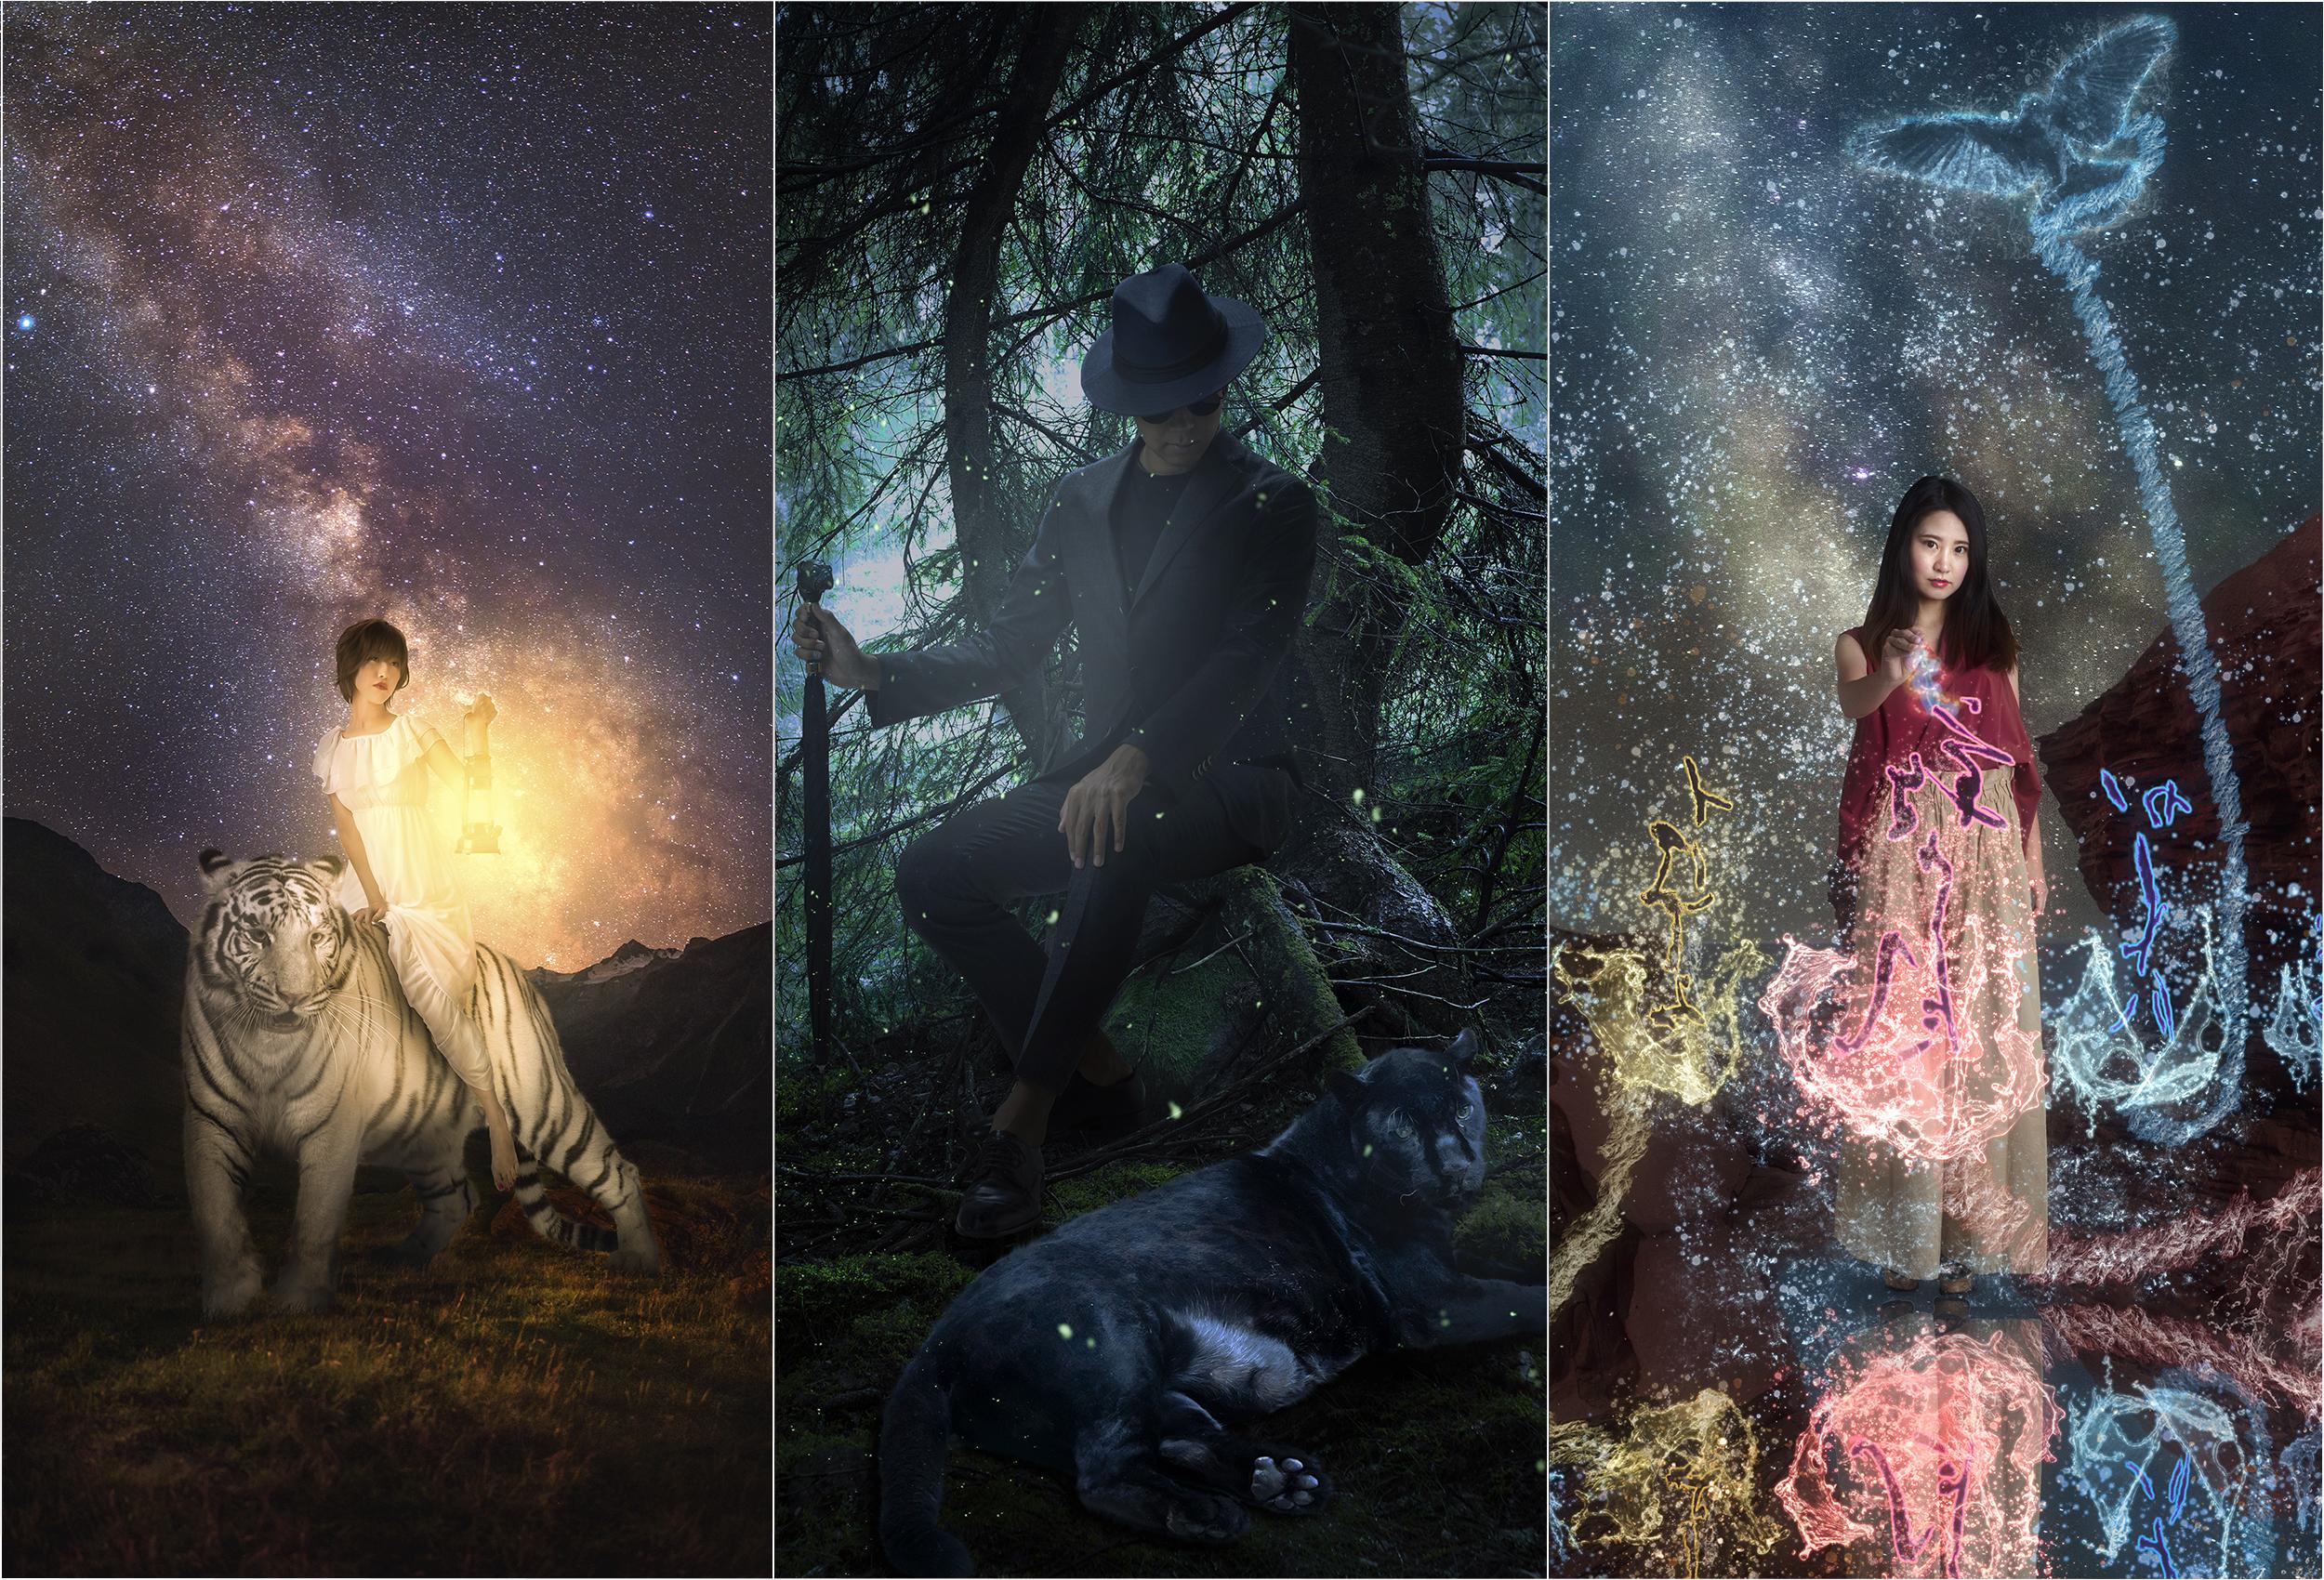 ImaginativelyM.I Photographer - Photoshopを駆使して自分の世界観と被写体の世界観を融合させて編集し作品として仕上げる